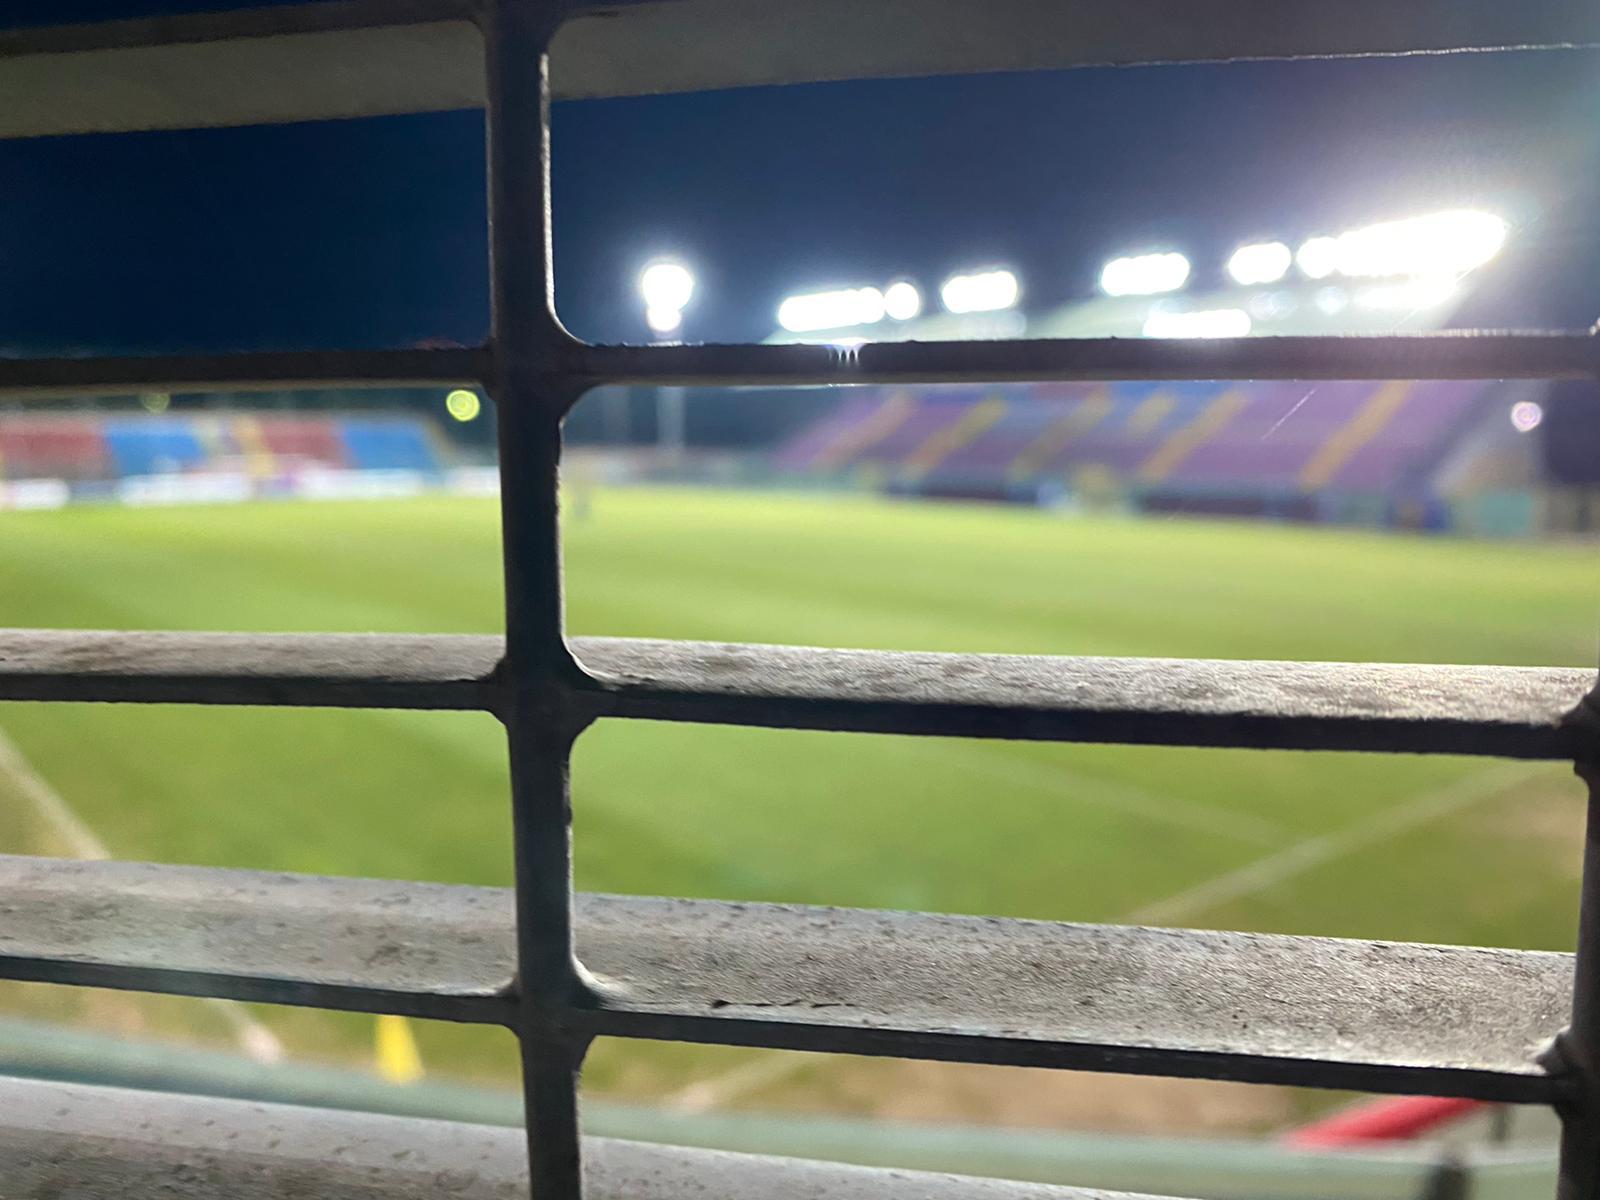 VIBONESE - VITERBESE | Match posticipato alle 20:30 immagine 16334 US Vibonese Calcio